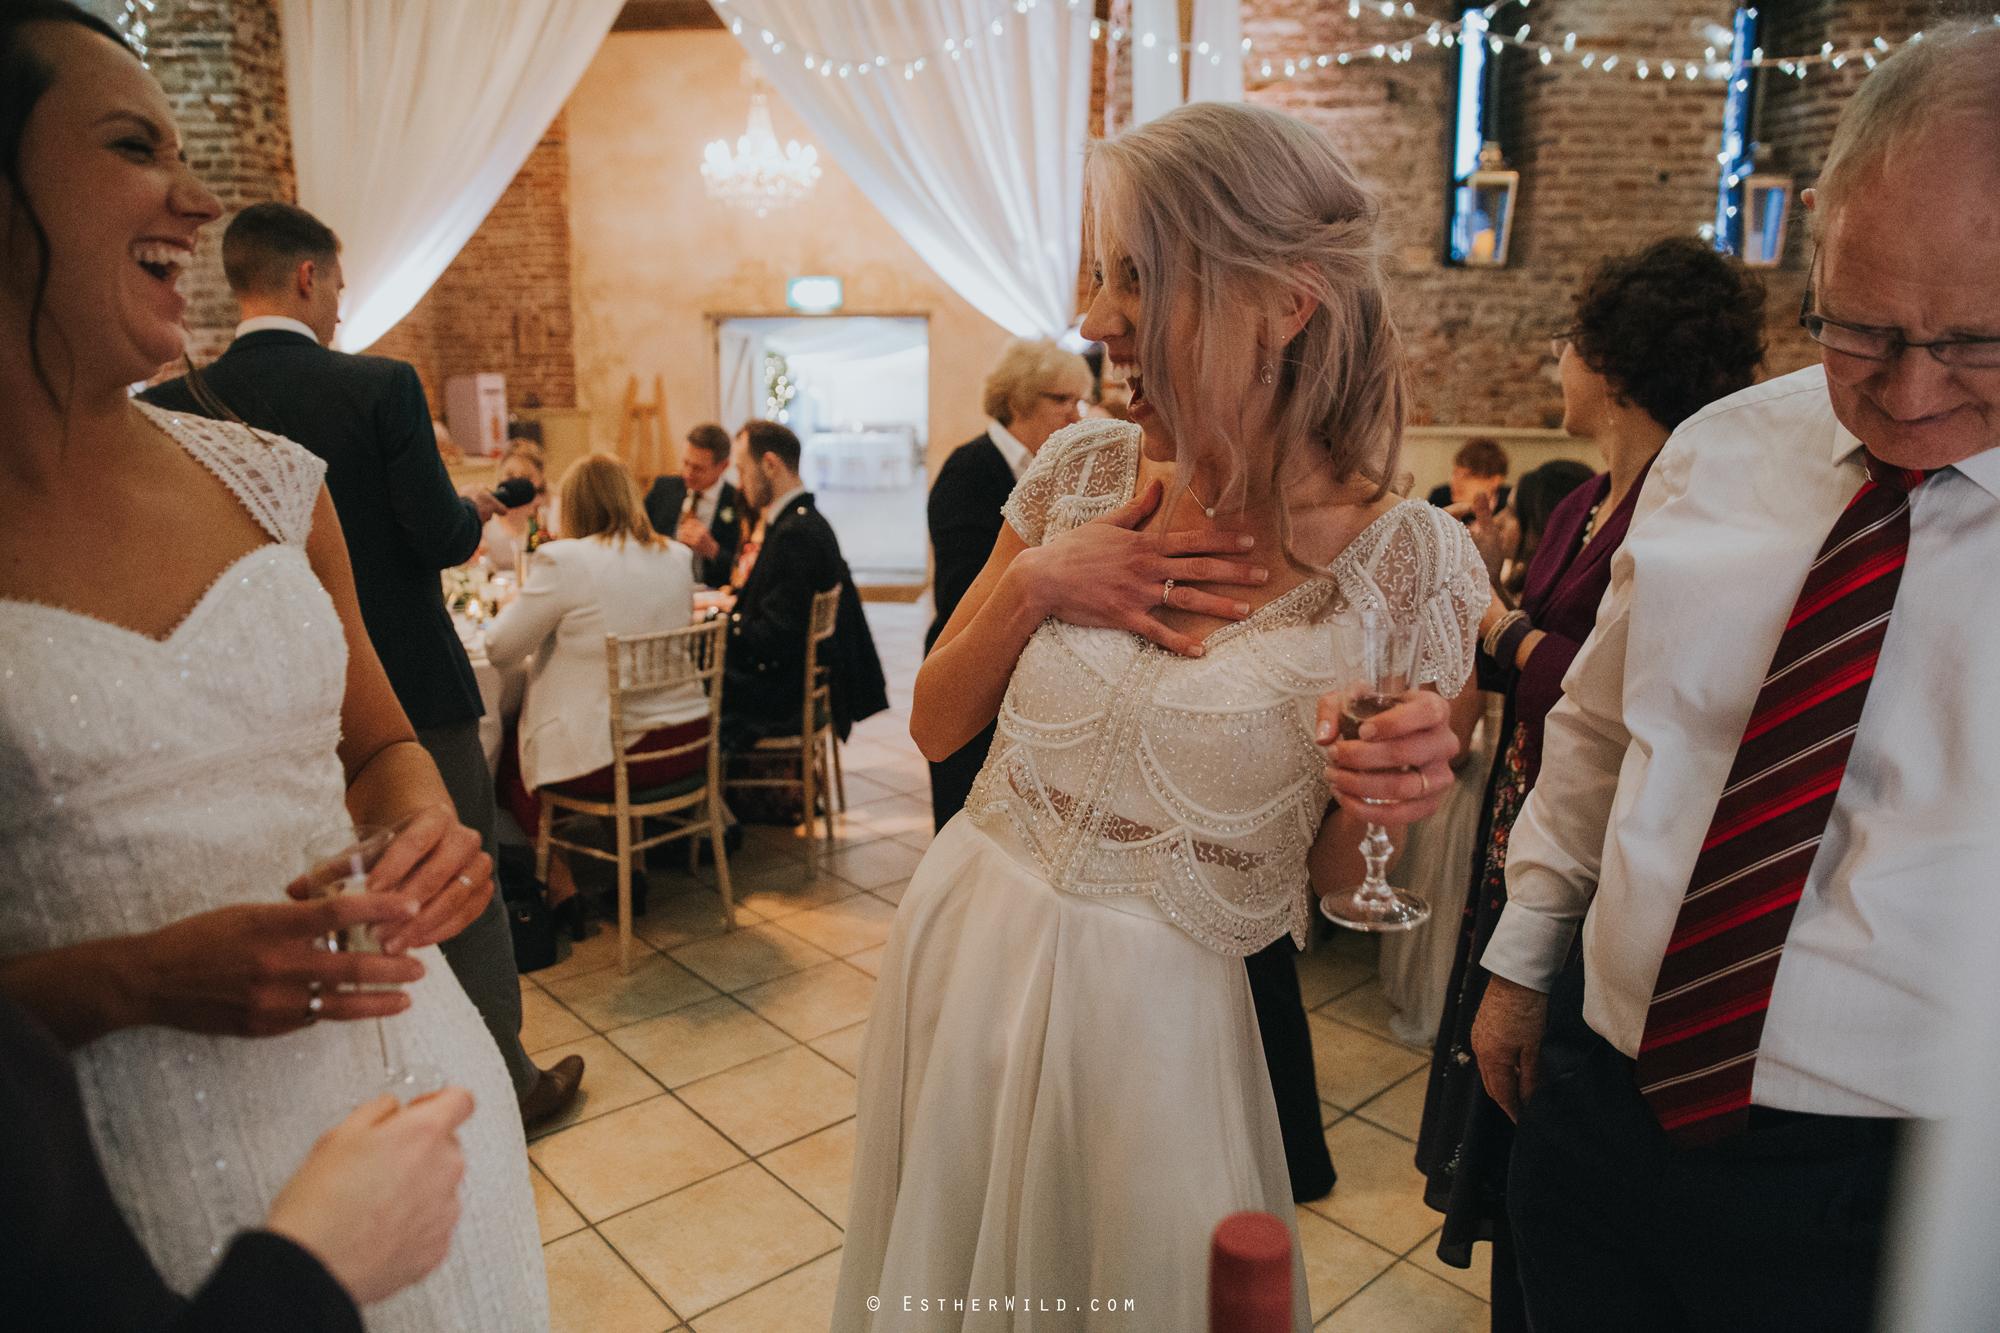 Elms_Barn_Weddings_Suffolk_Photographer_Copyright_Esther_Wild_IMG_2345.jpg